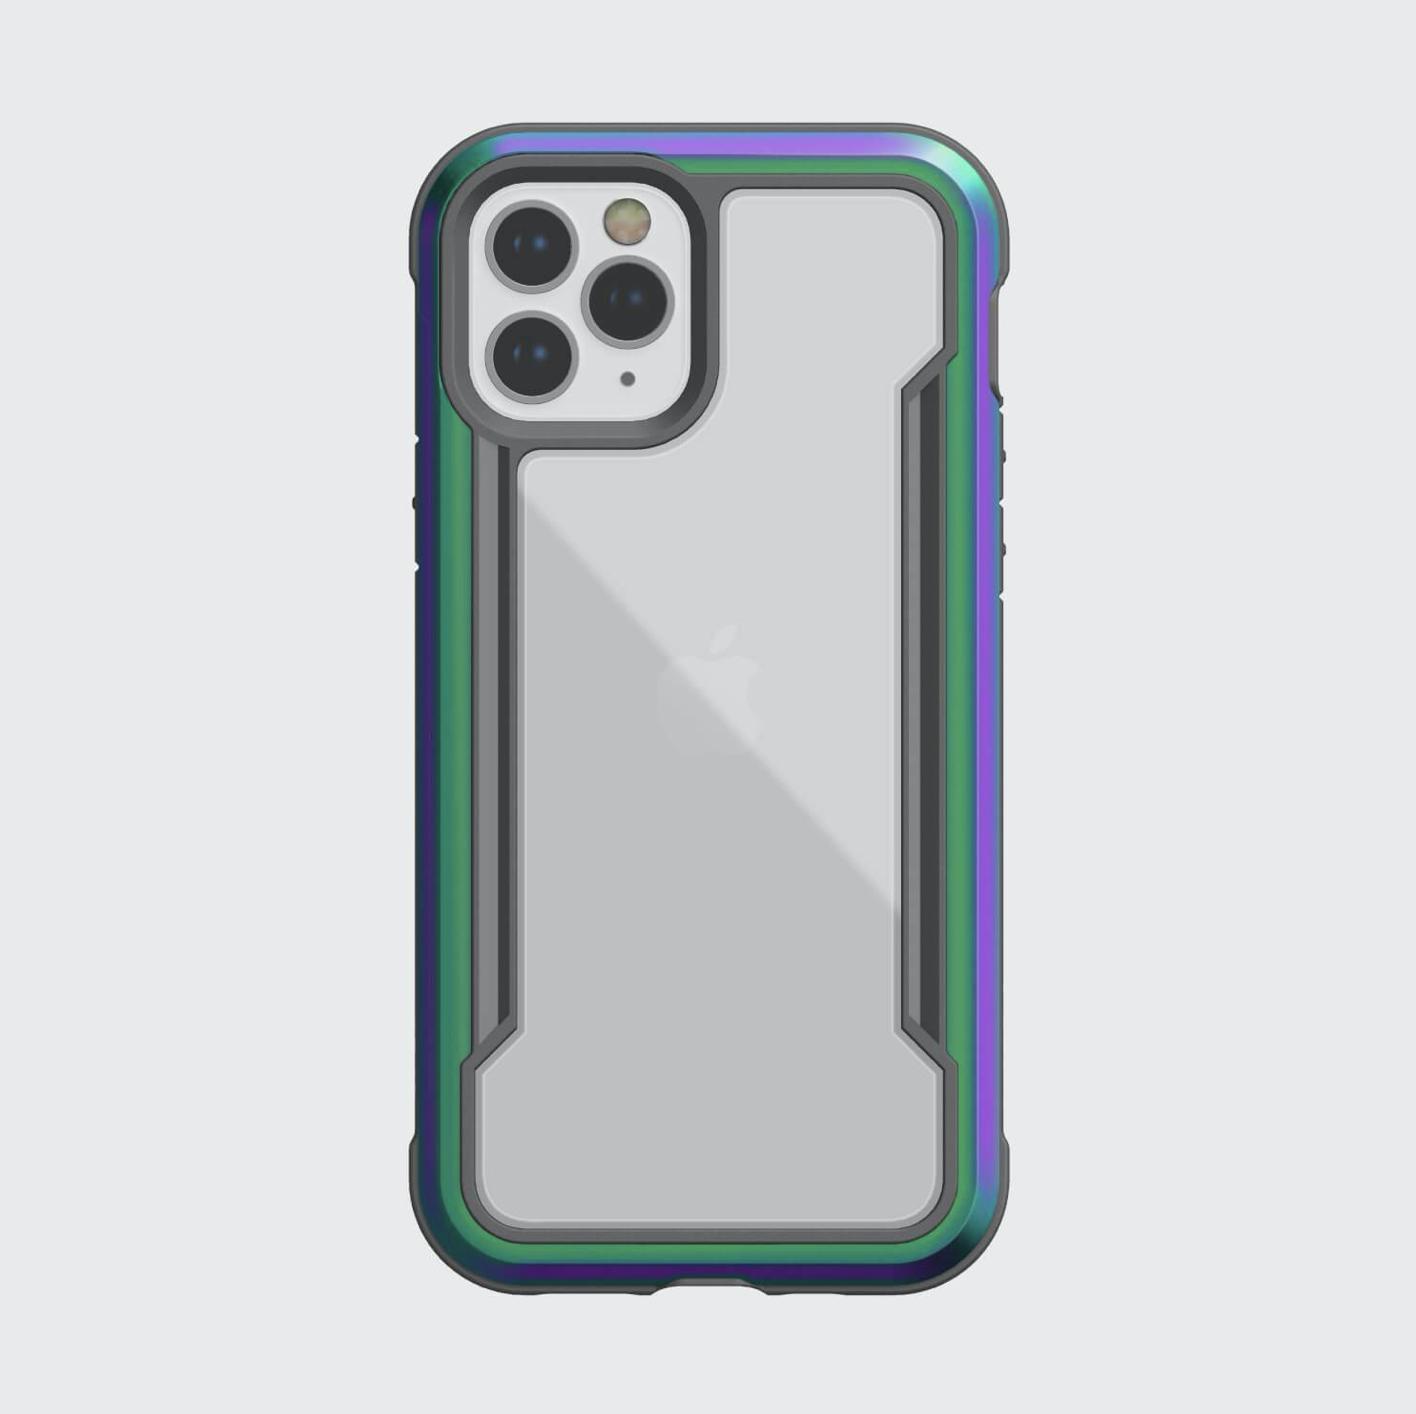 Estuche XDORIA Raptic Shield Tornazol - IPHONE 12 MINI 5.4